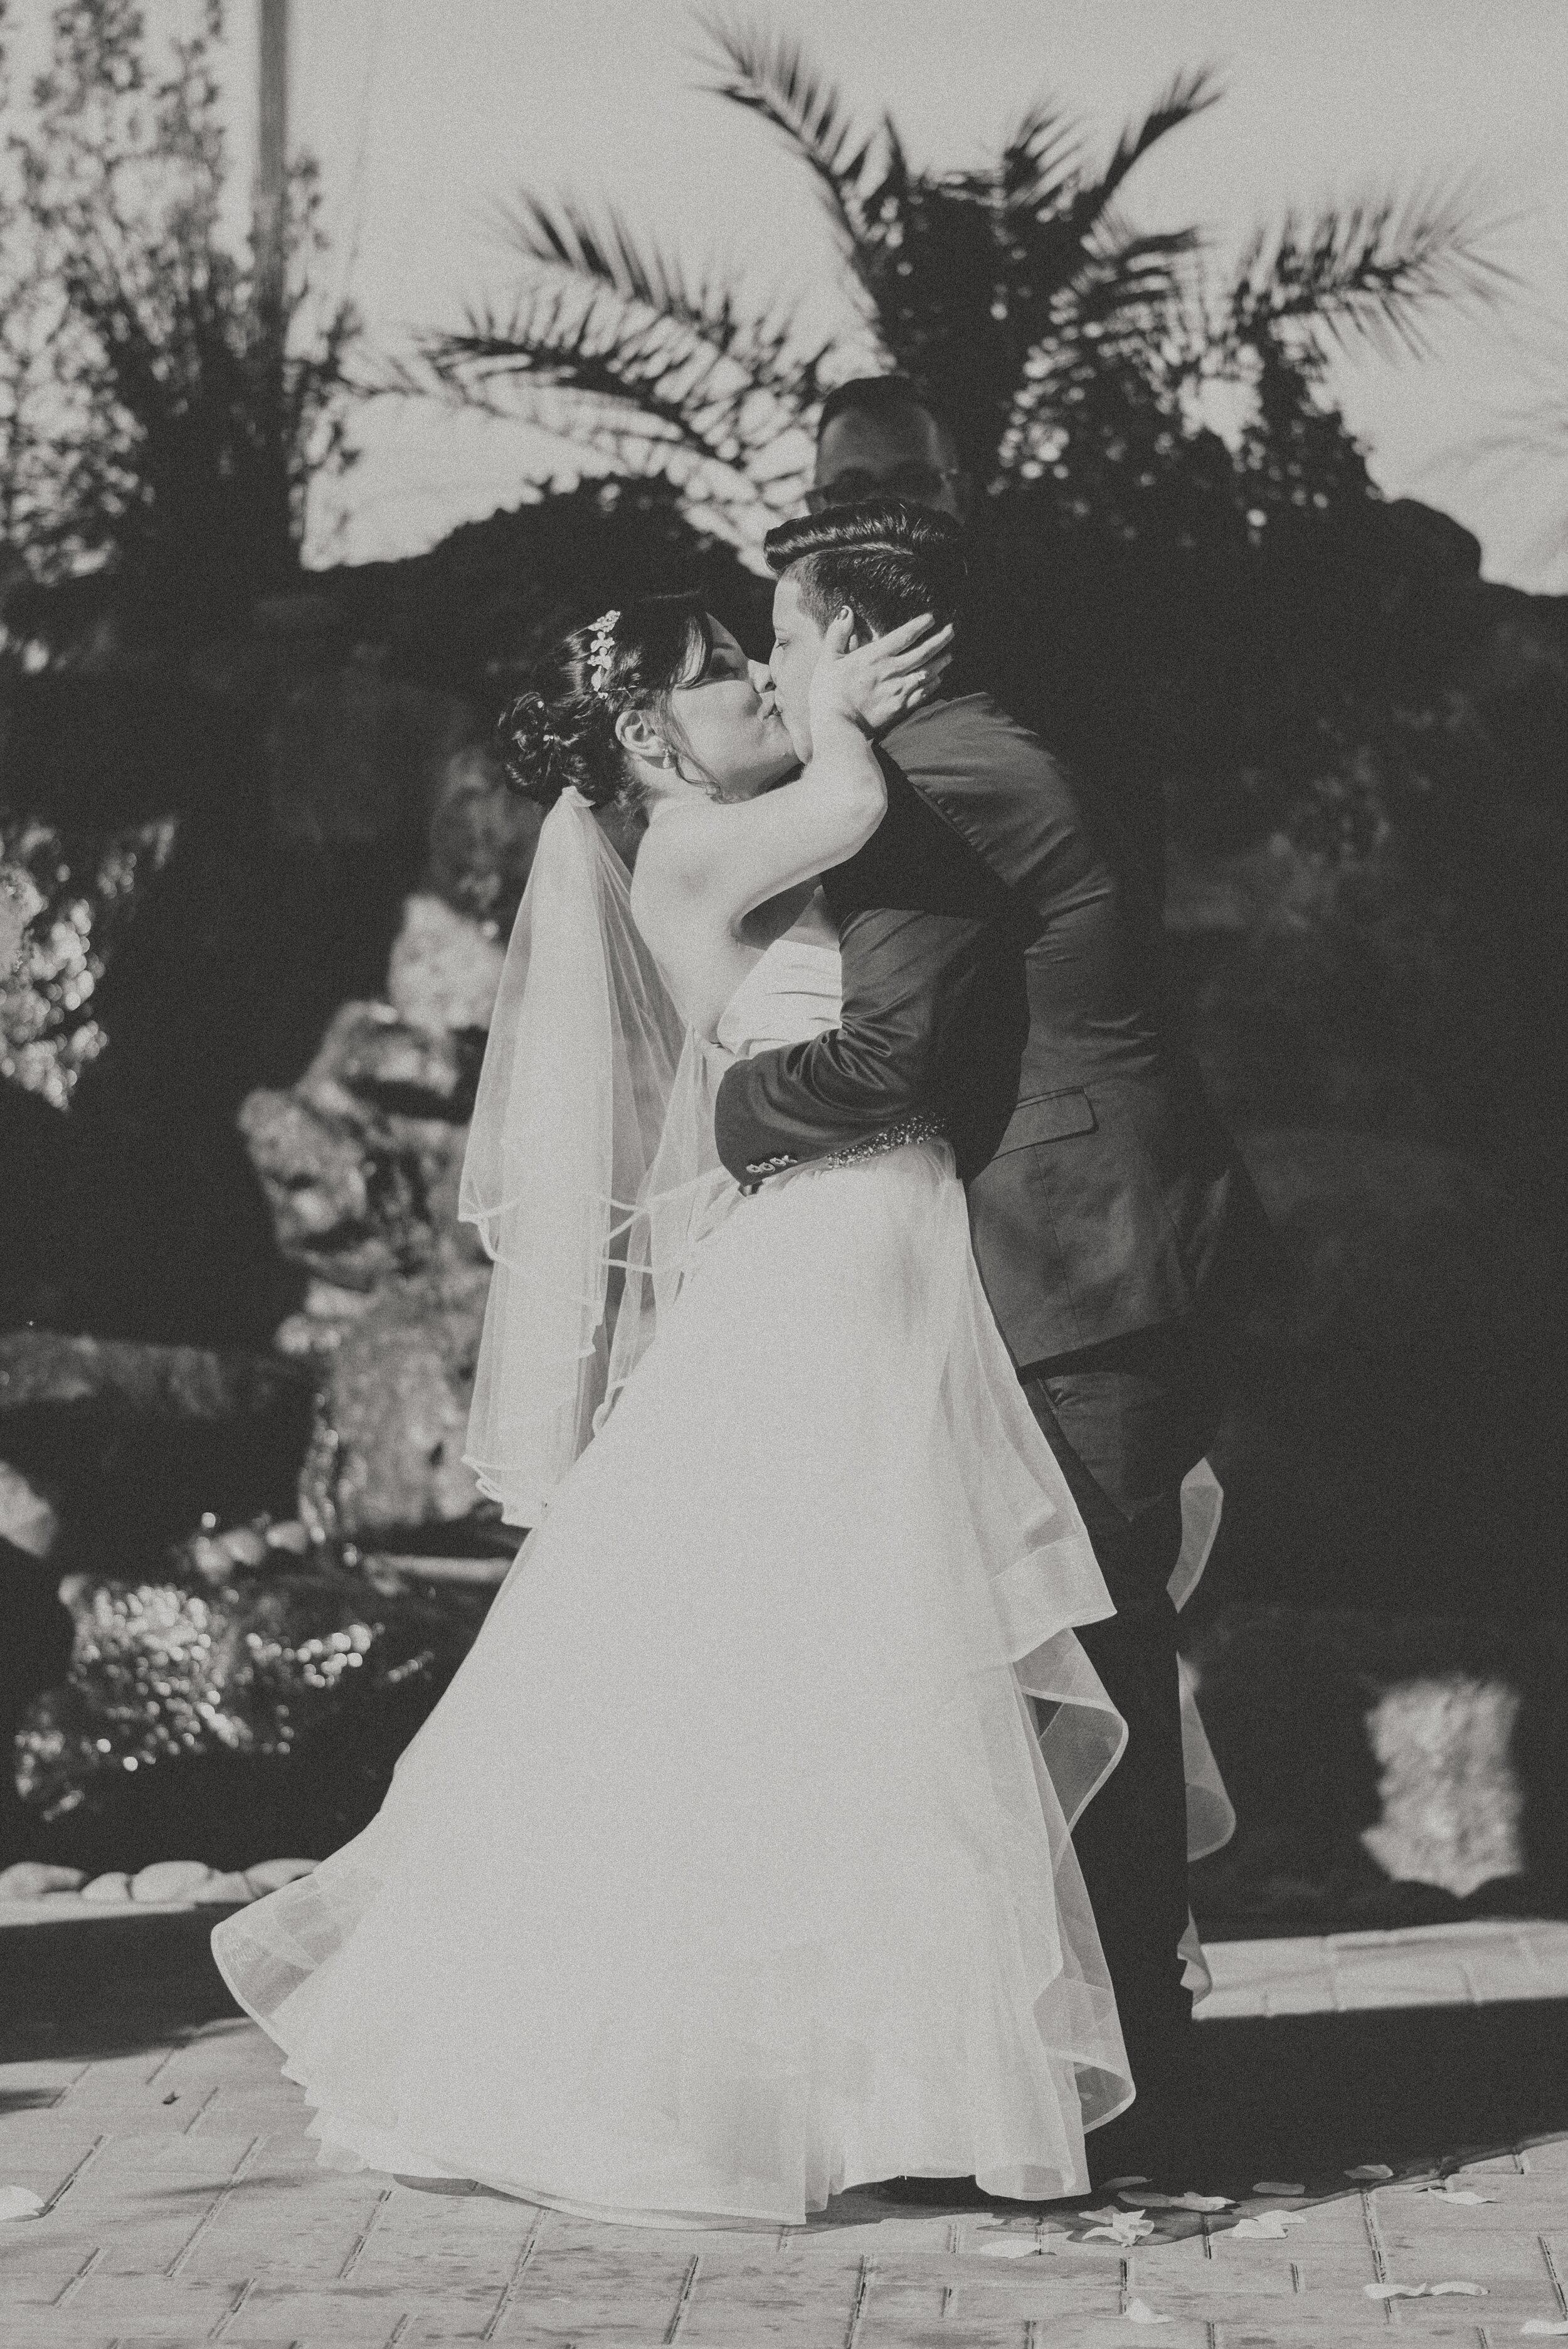 Joei & Betty - Ceremony-43.jpg